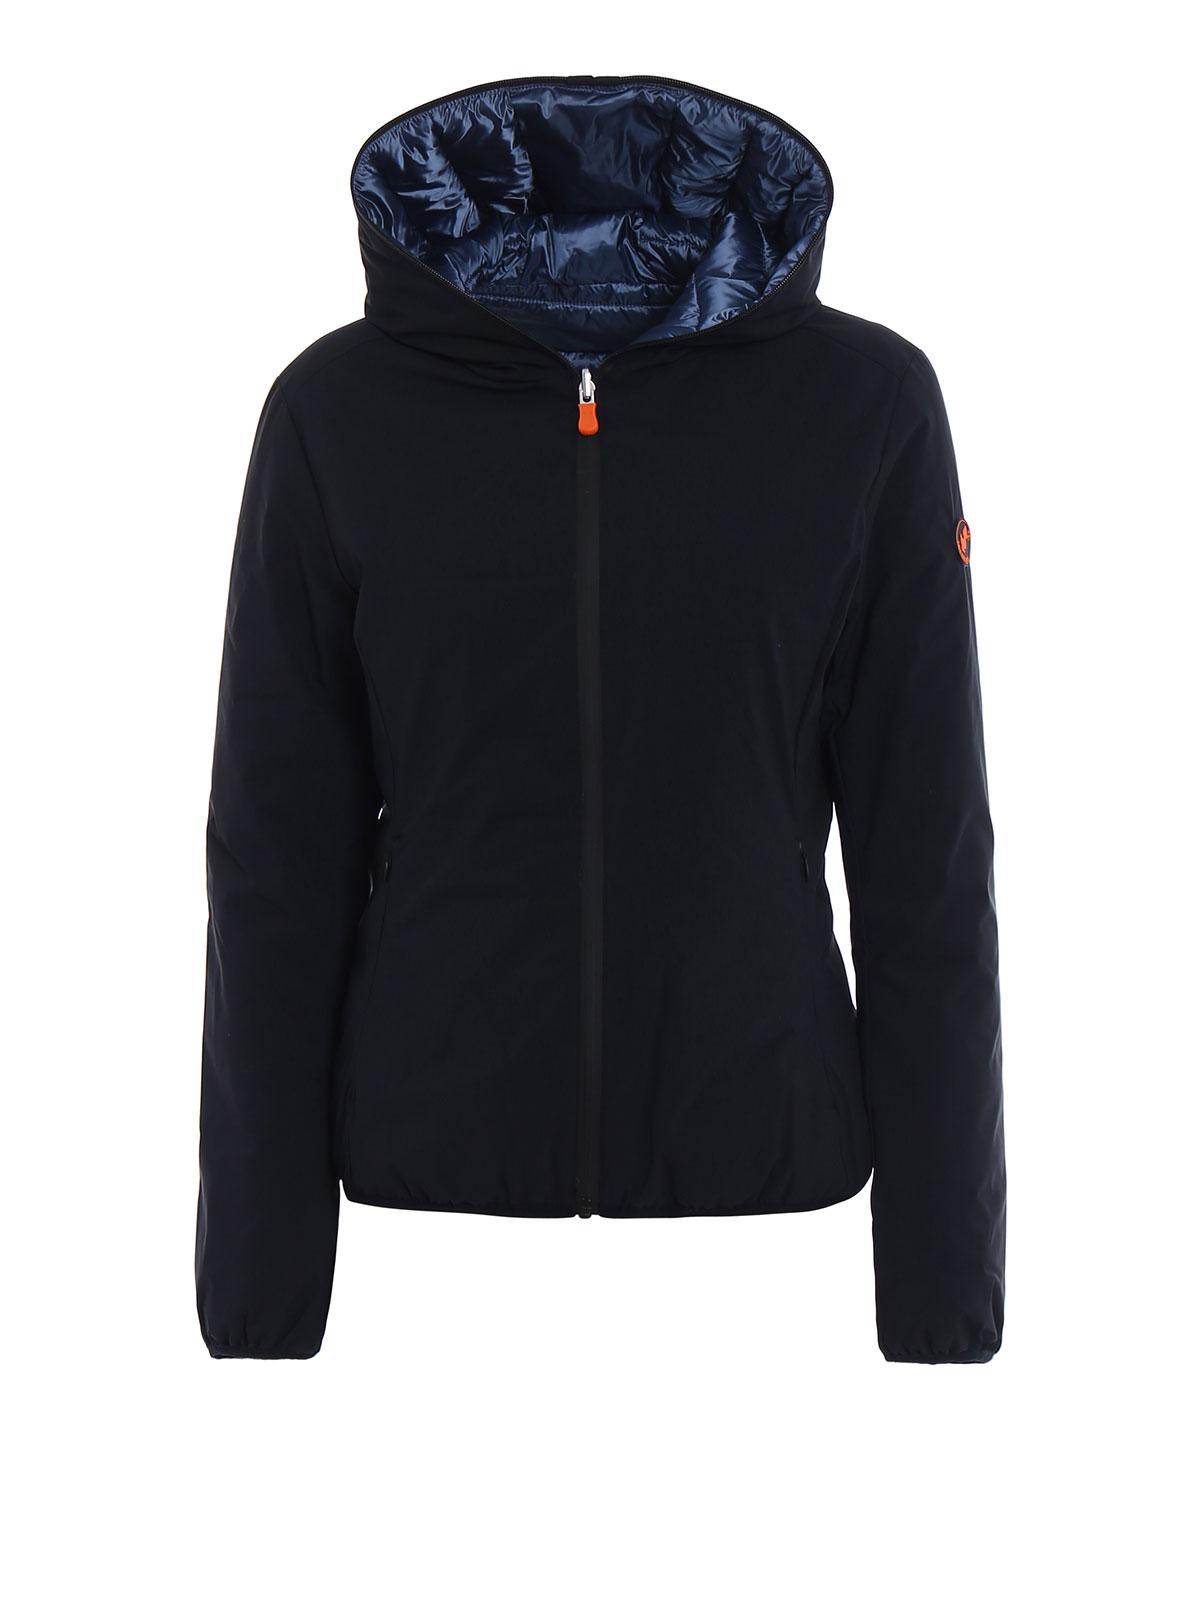 Reversible Nylon Jacket 79